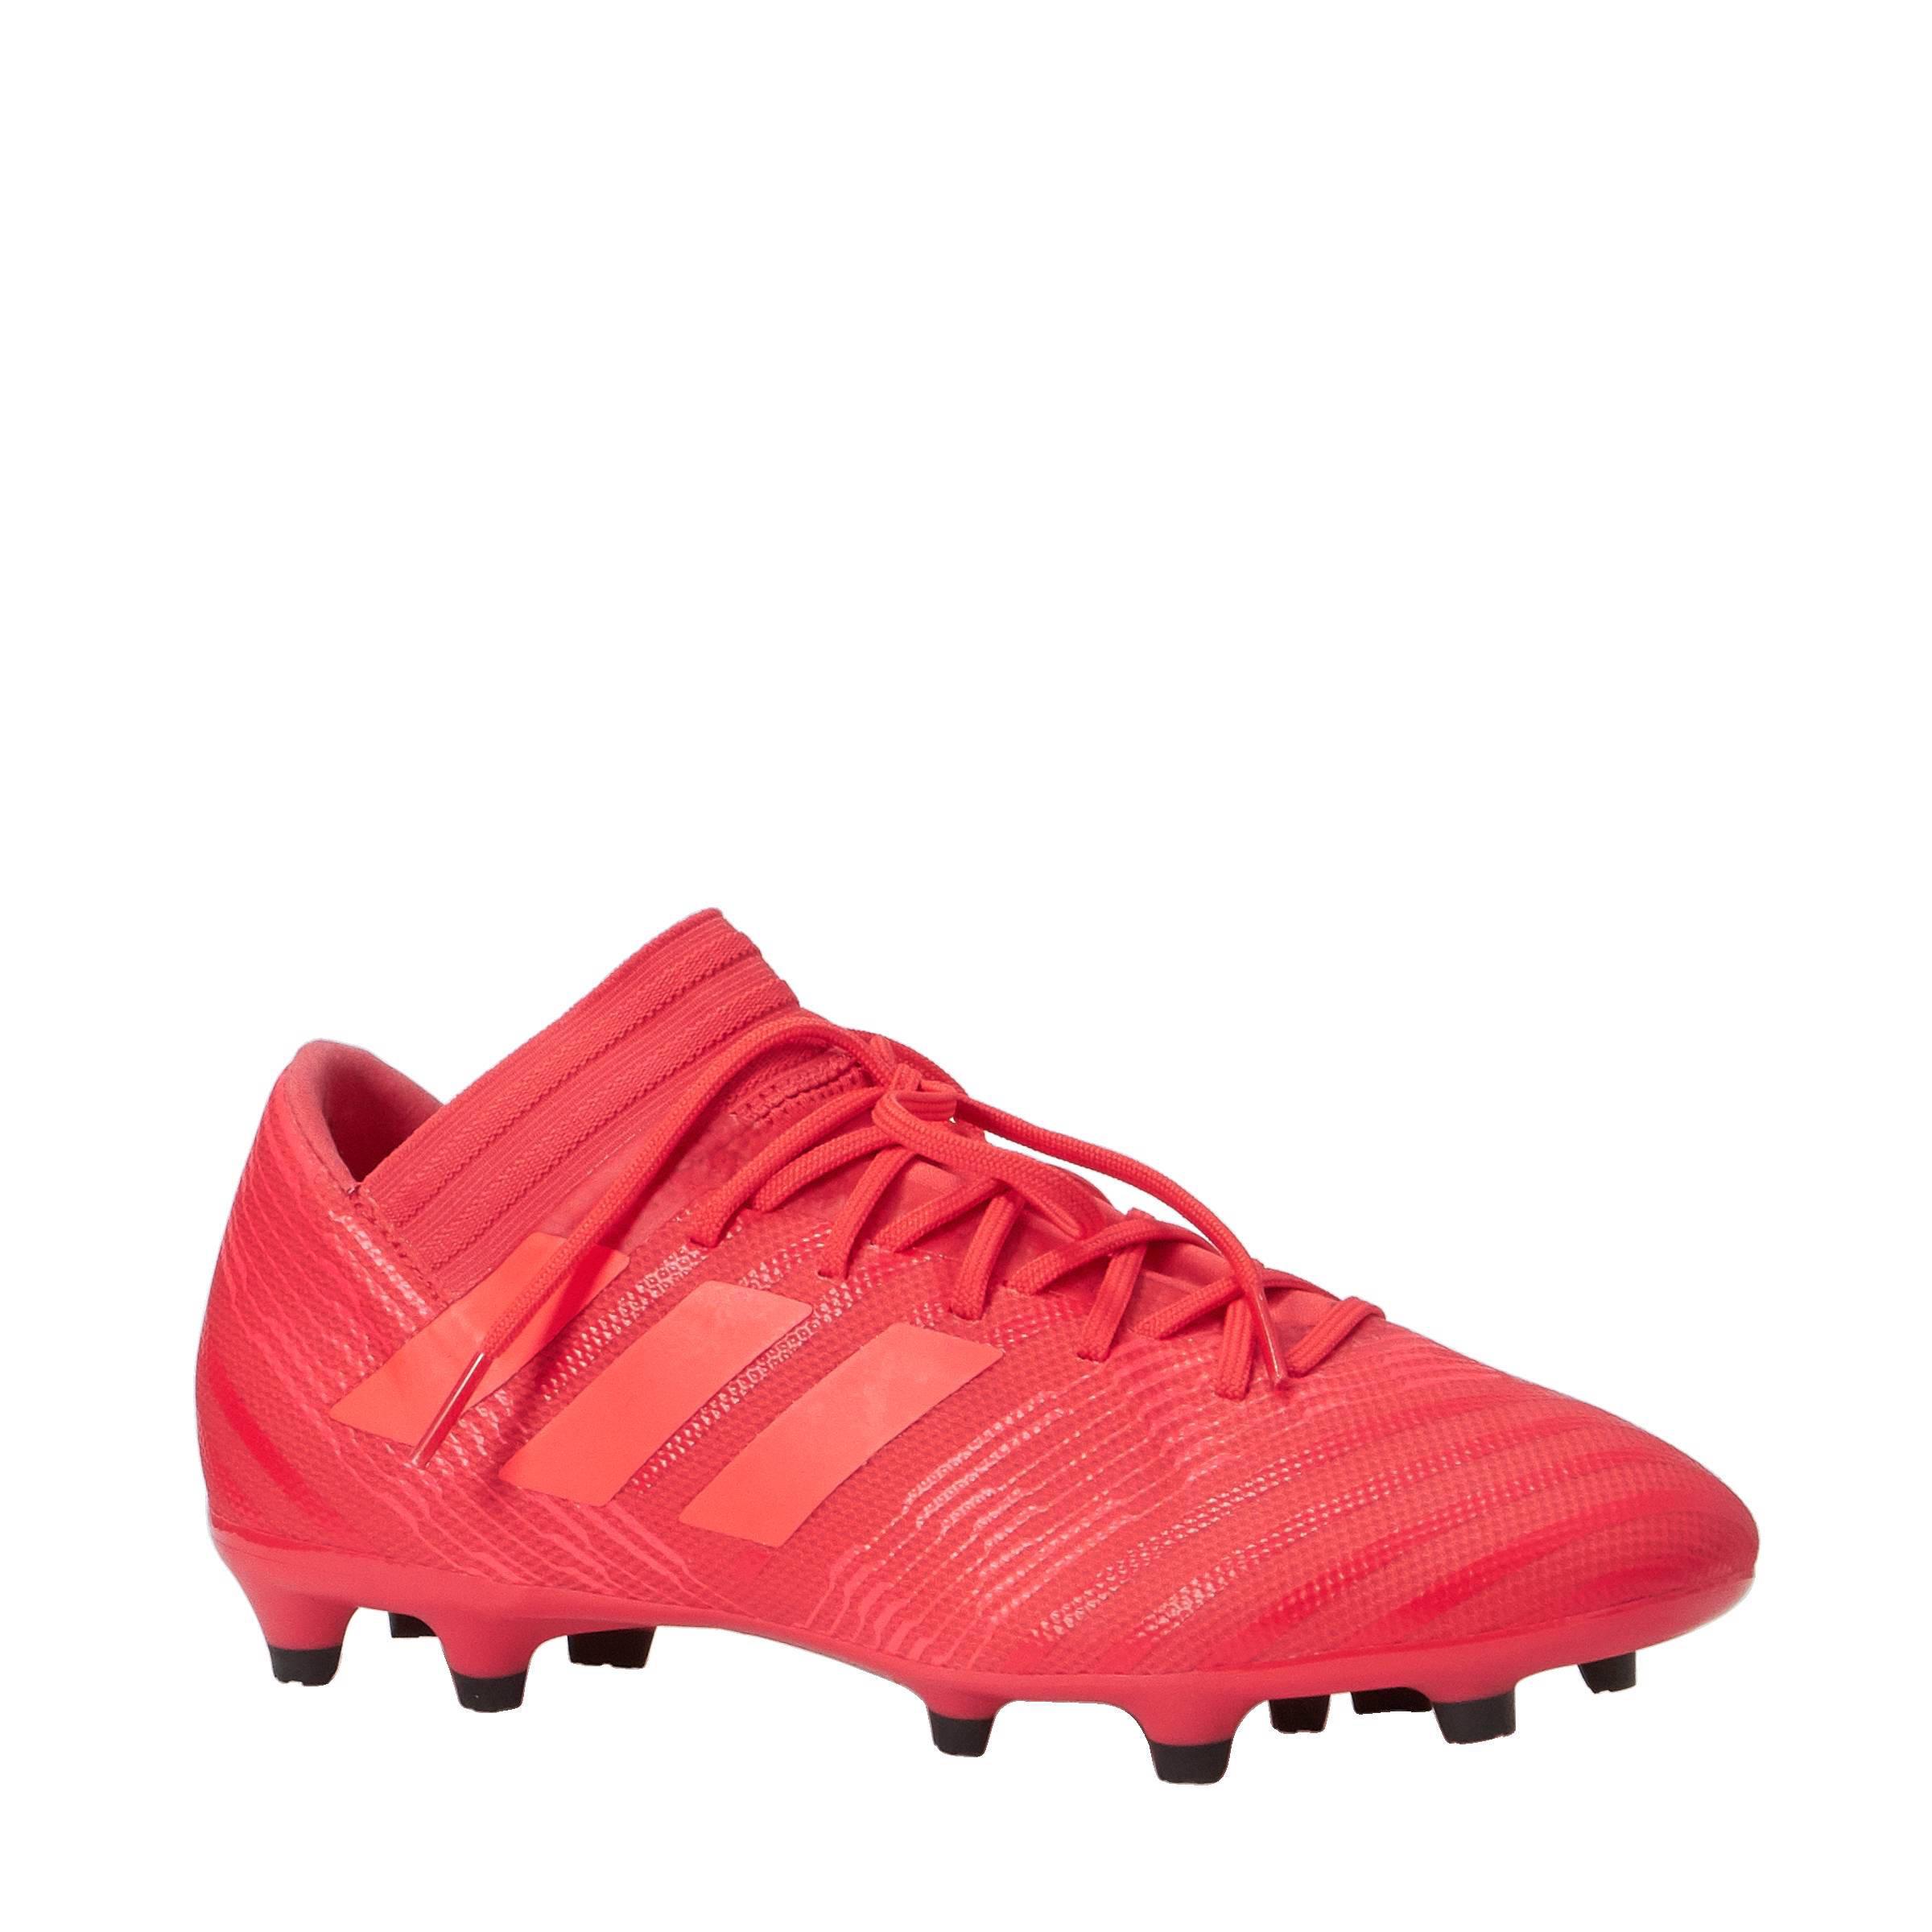 adidas performance Nemeziz 17.3 FG voetbalschoenen | wehkamp